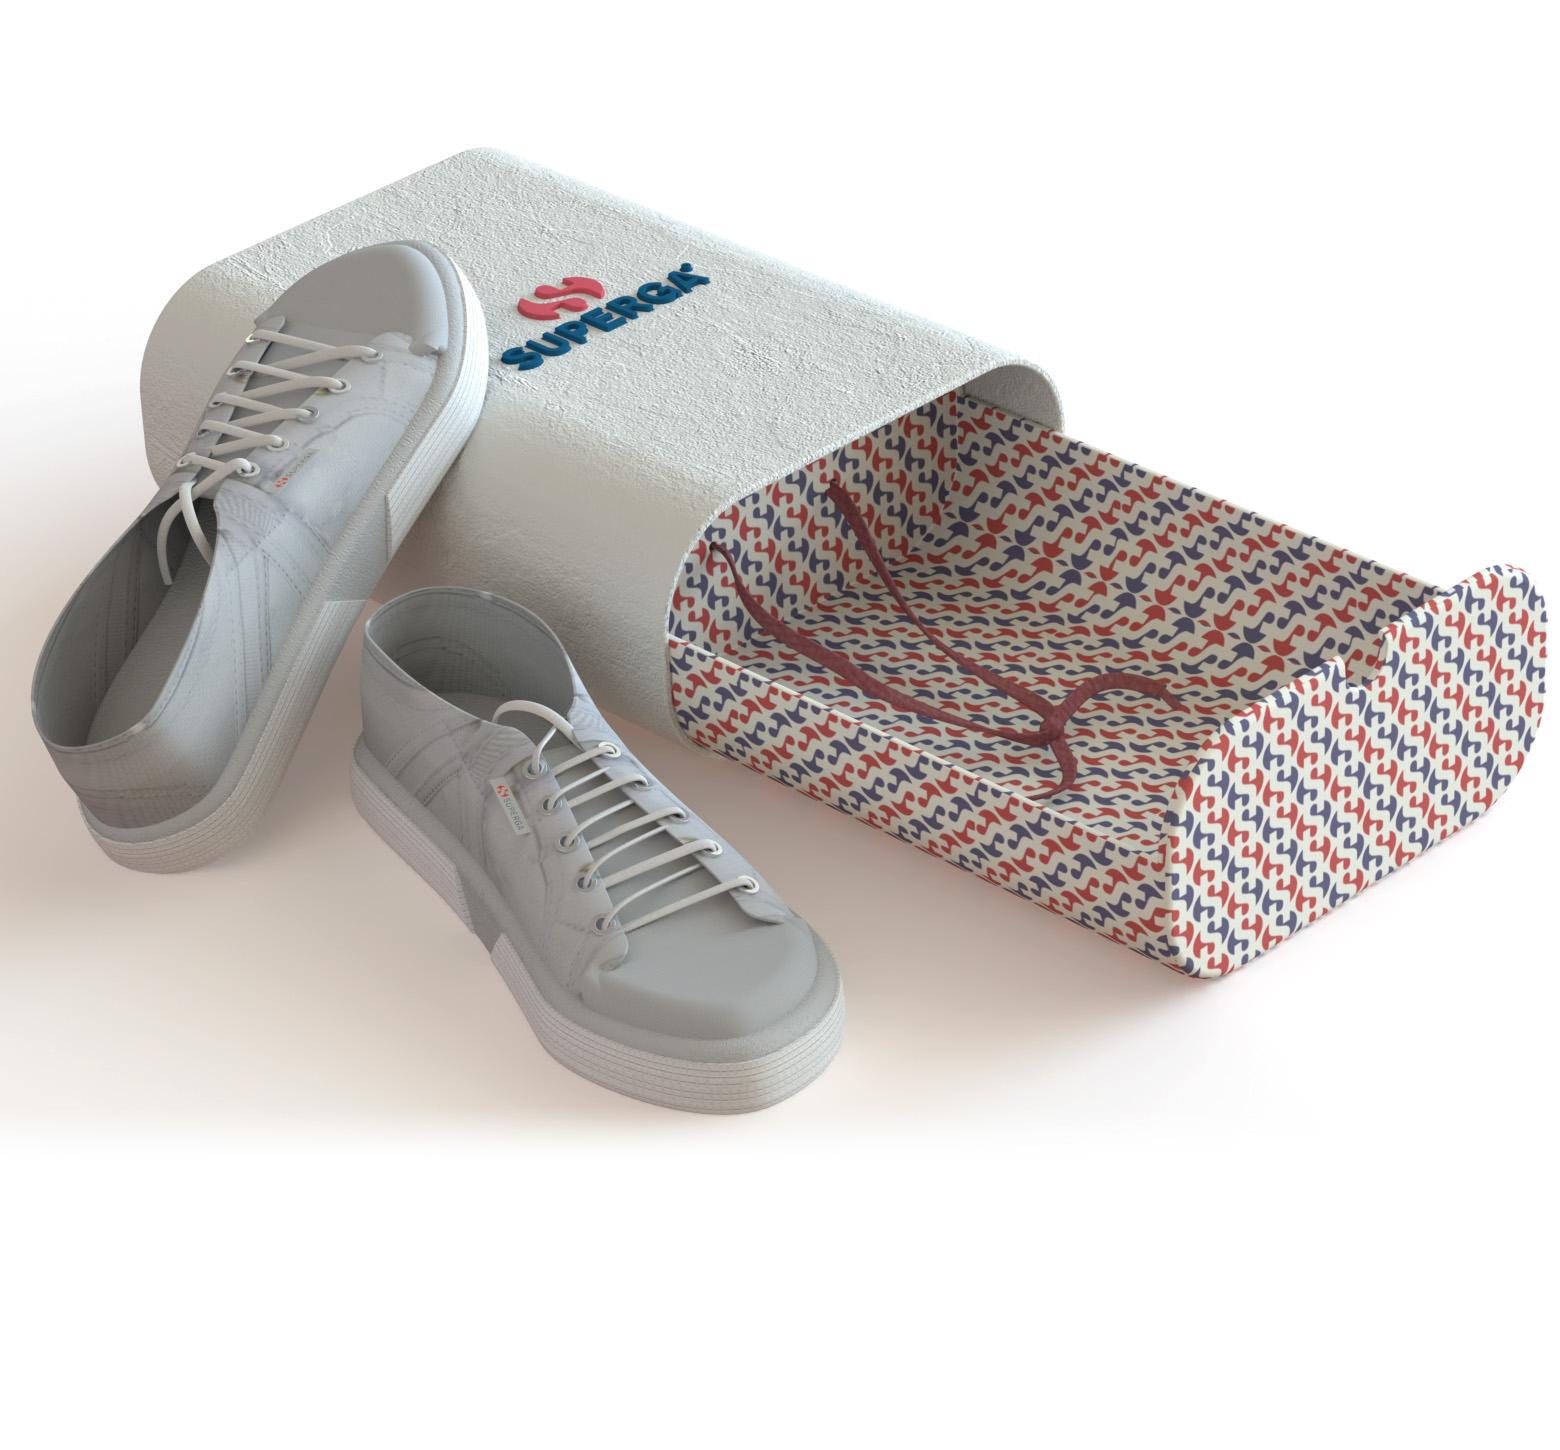 Packaging Design Archive - SUPERGA SHOE BOX